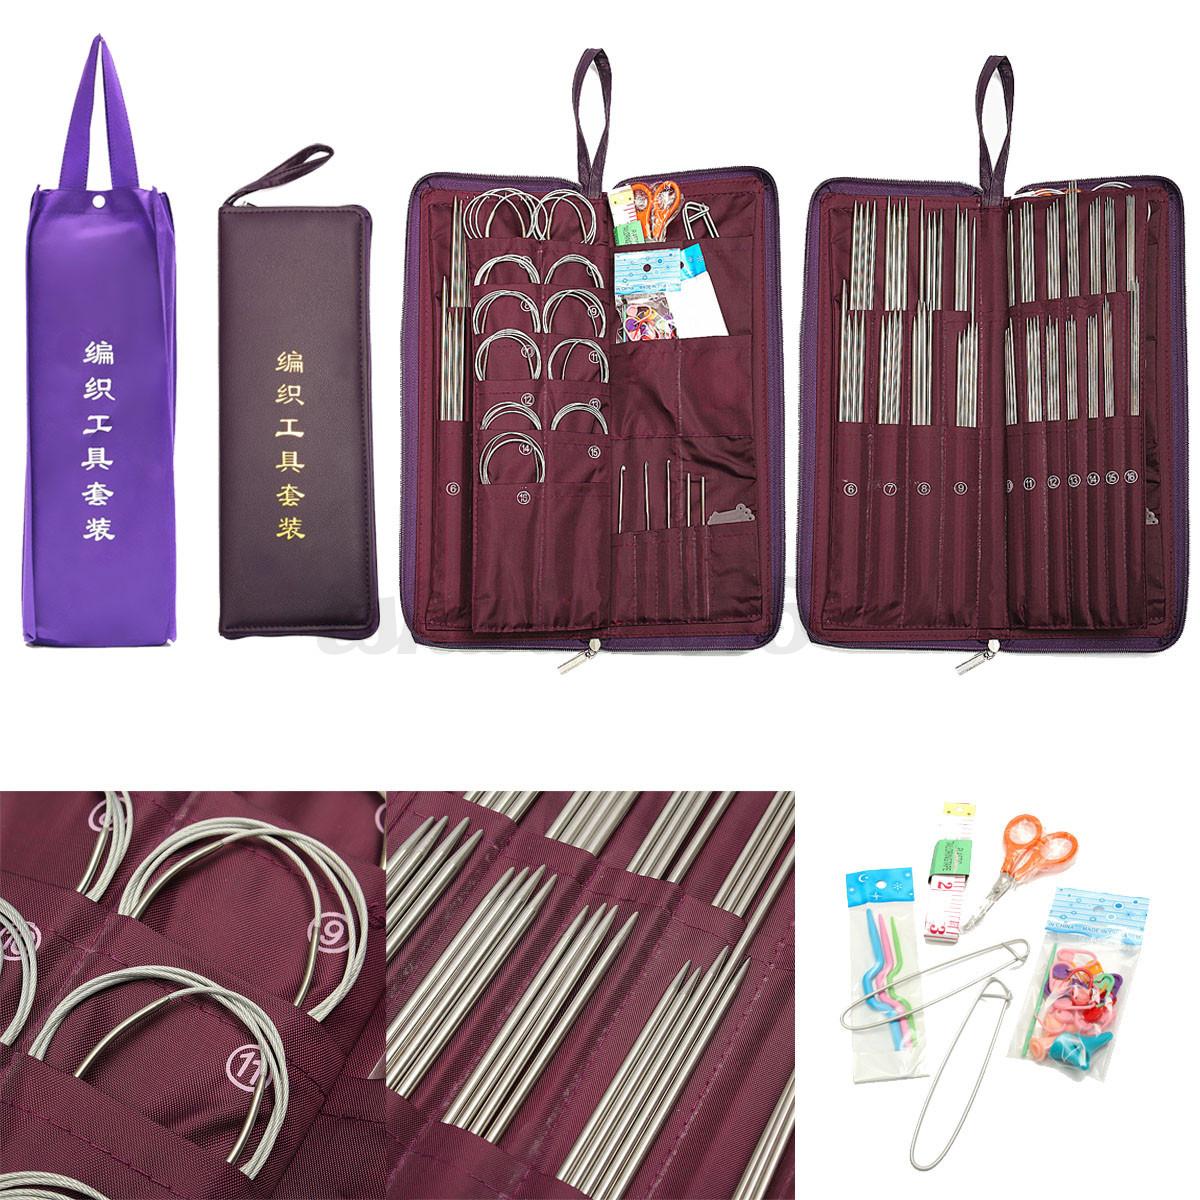 ... Steel Straight Circular Knitting Needles Crochet Hook Weave Set eBay